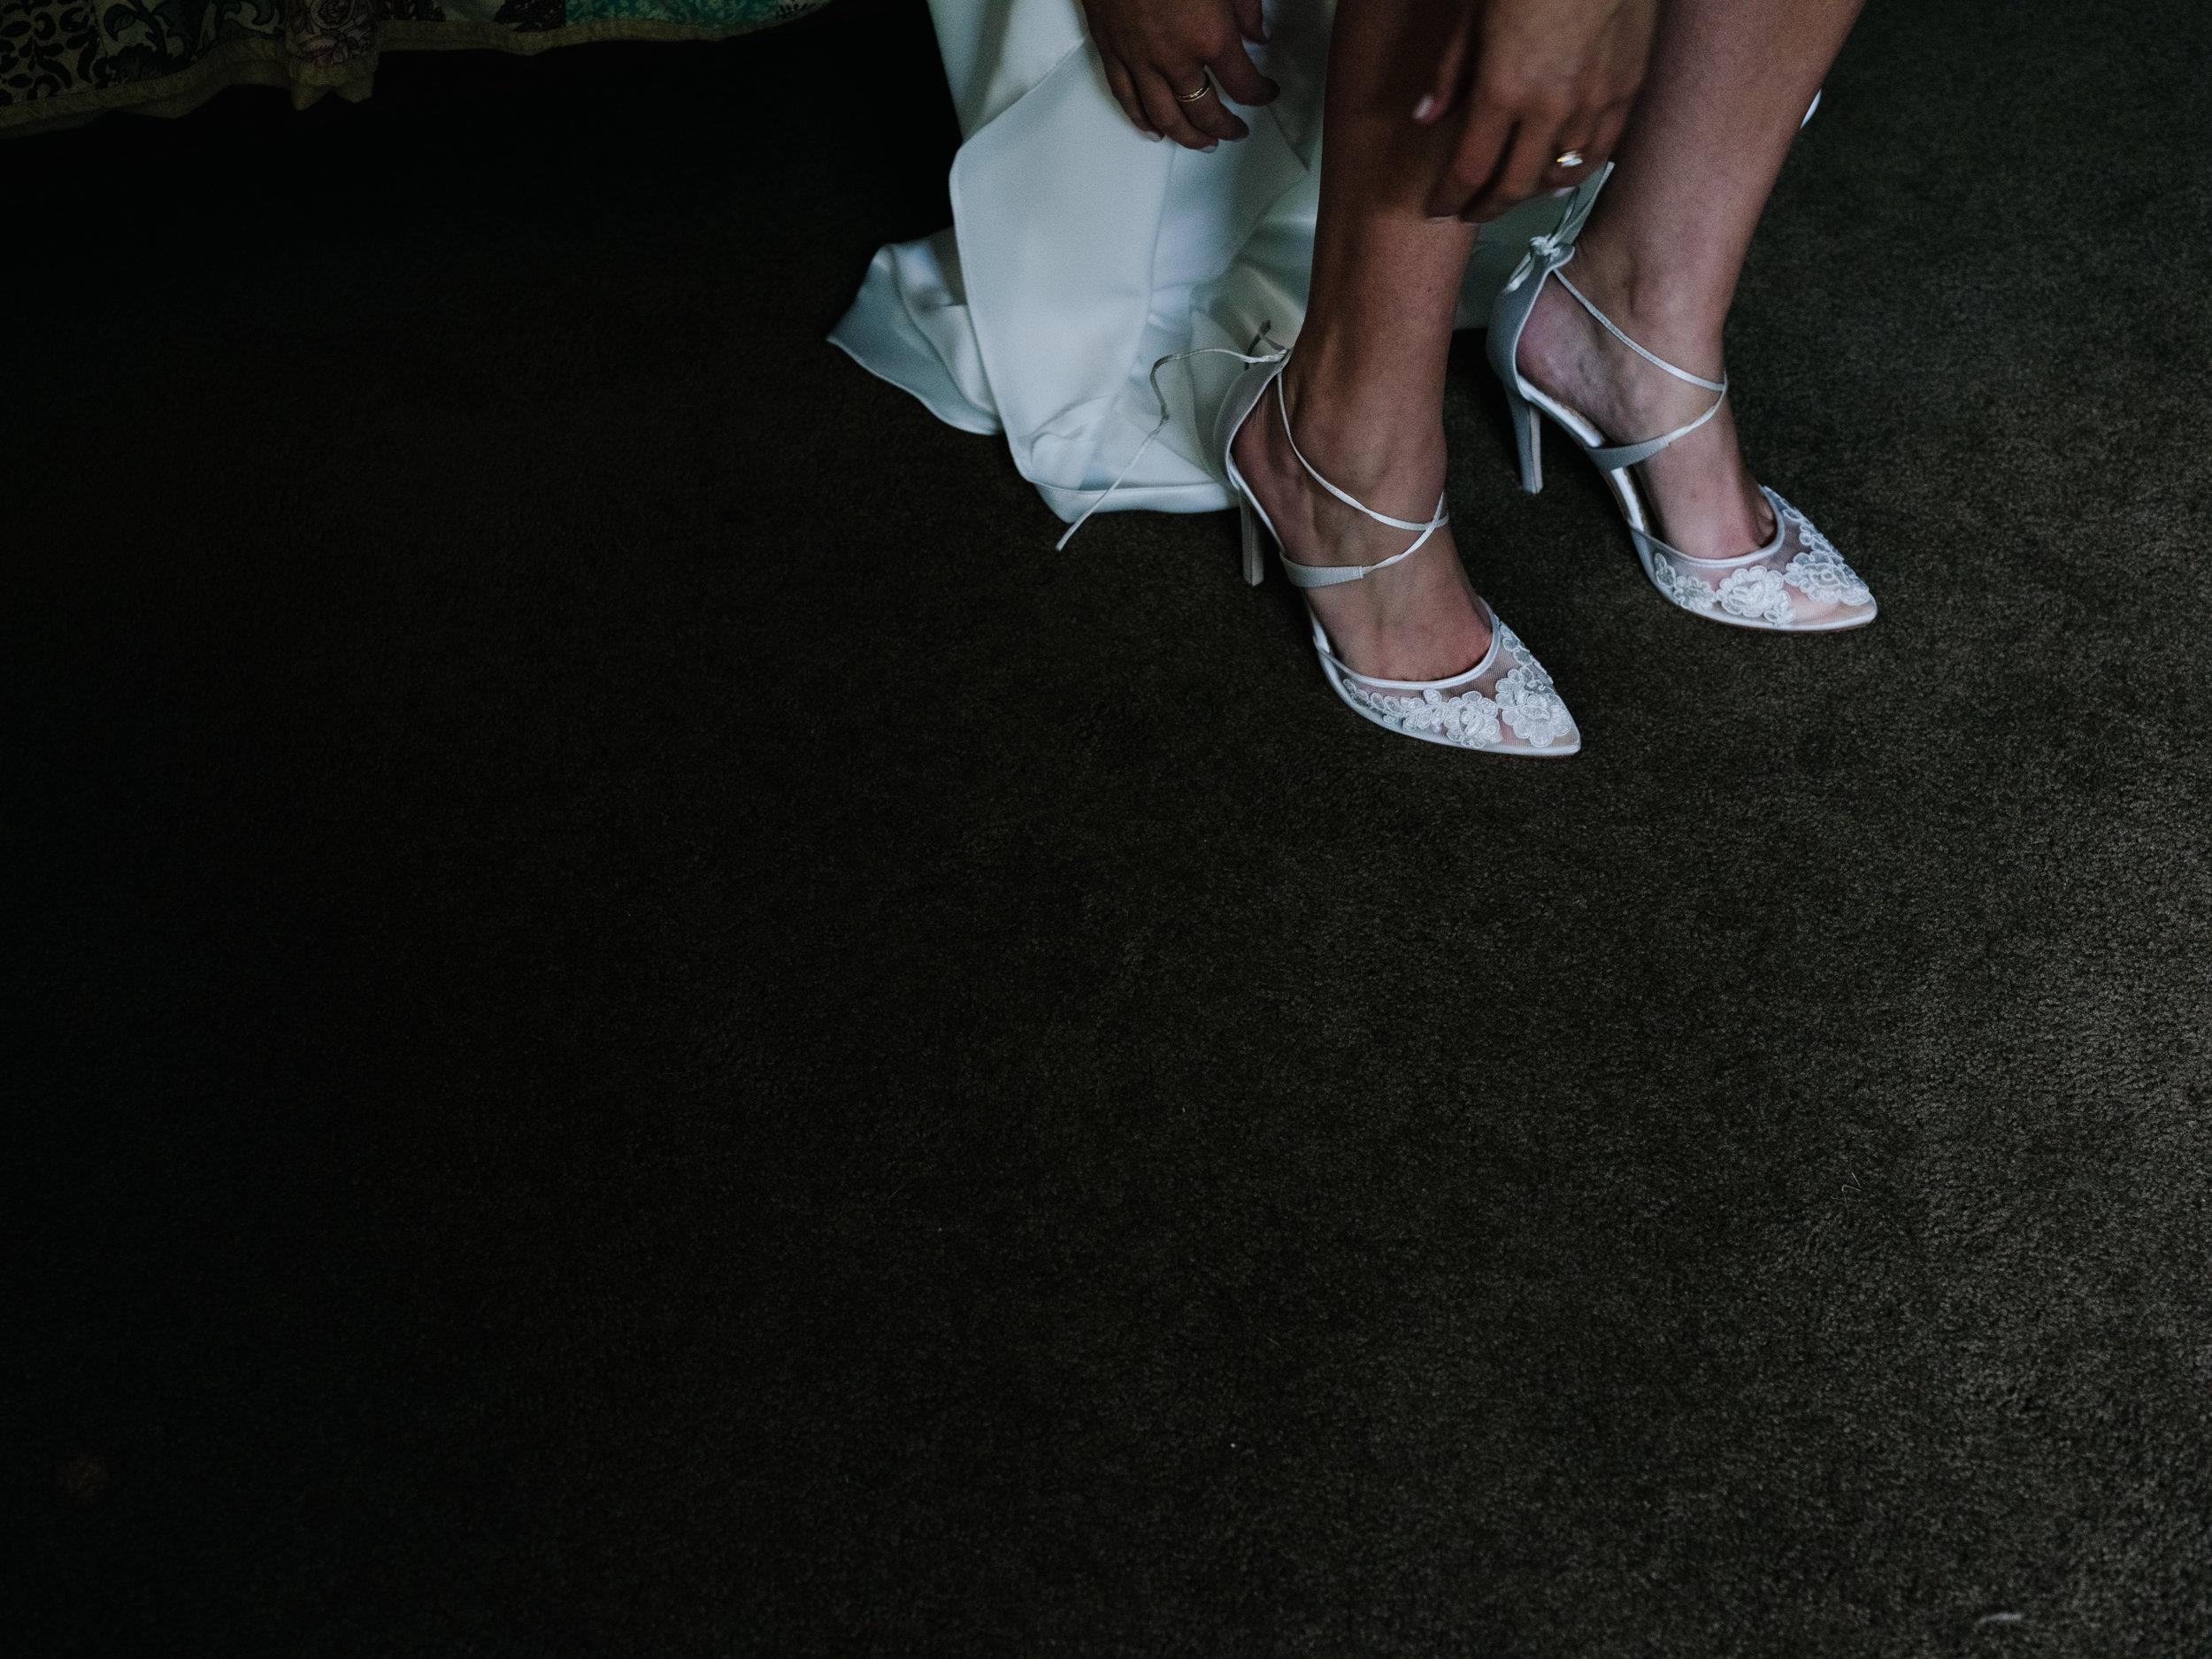 Mikaela-And-Frank00122.jpg